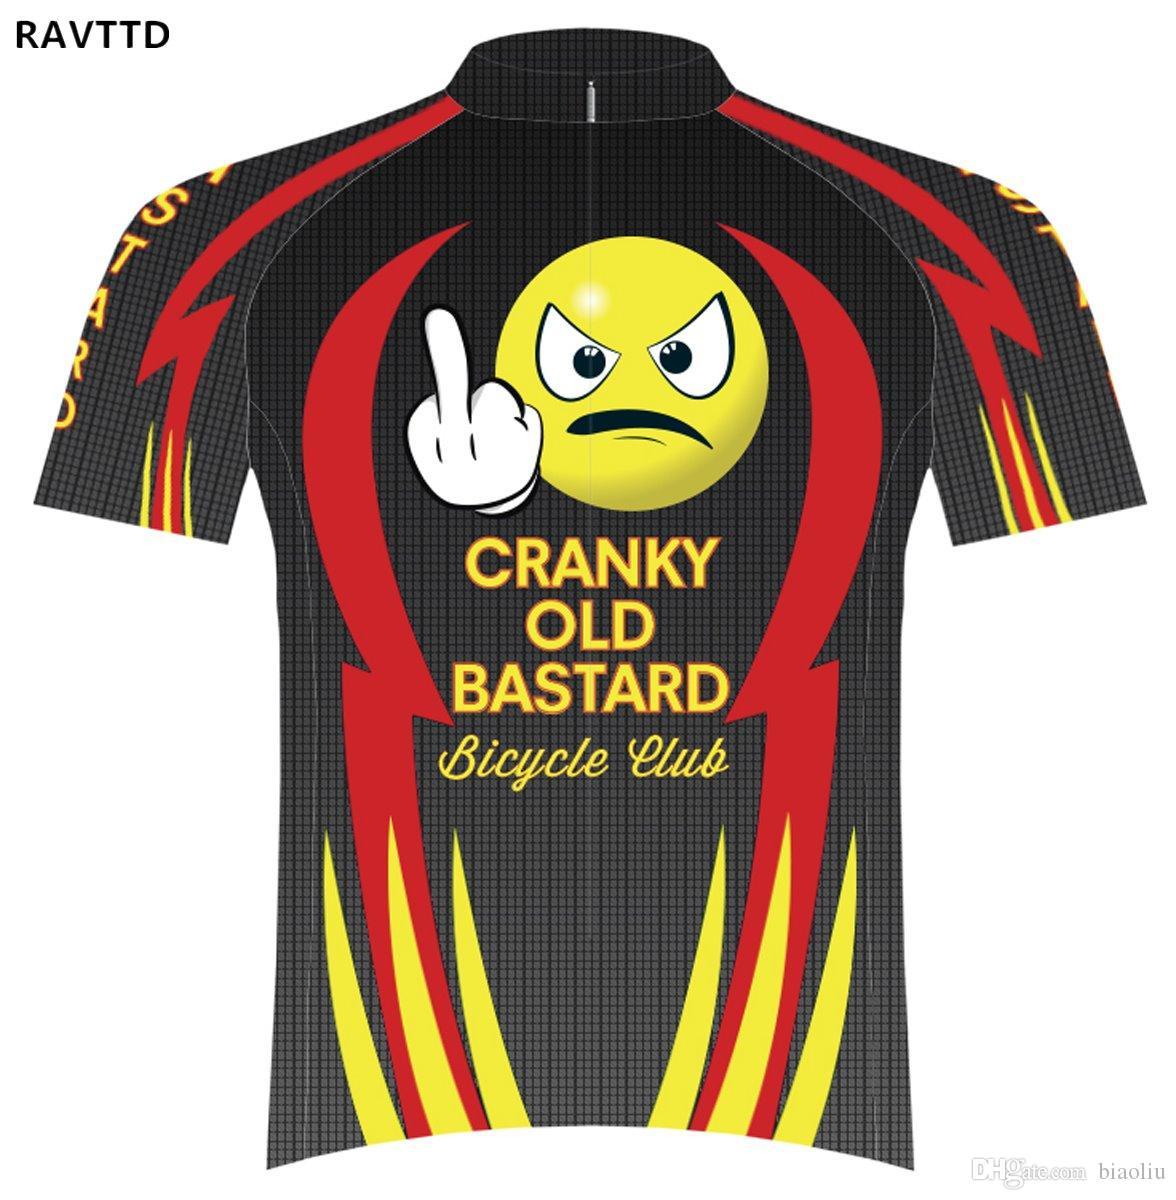 Cranky Old Bastard 2018 Cycling Jersey Tops Summer Racing Cycling Clothing  Ropa Ciclismo Short Sleeve Mtb Bike Jersey Shirt Maillot Ciclismo Cycling  Jackets ... 9f96b3054